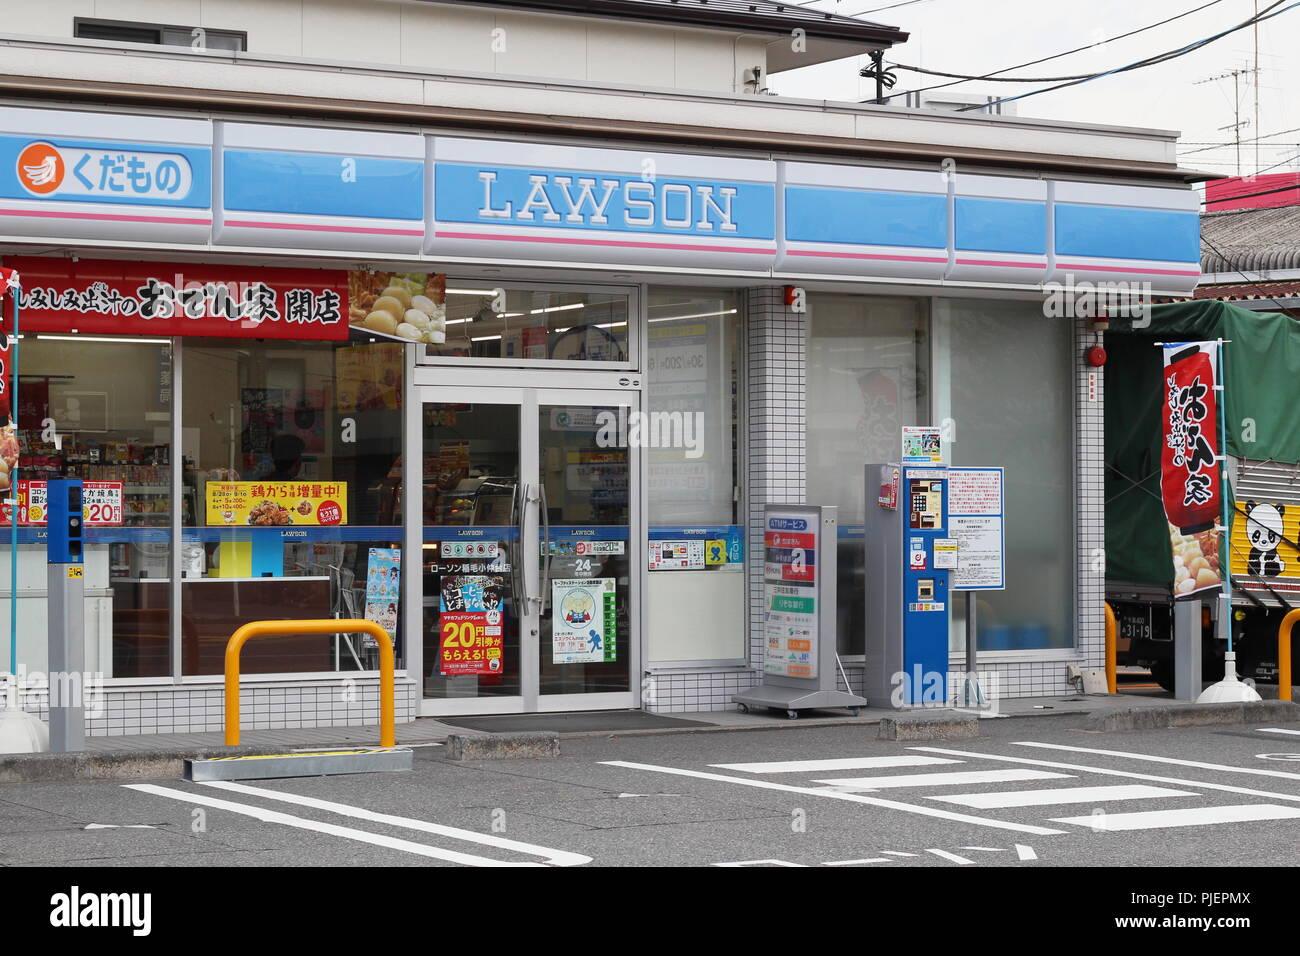 Lawson Convenience Store Stock Photos & Lawson Convenience Store Stock Images - Alamy